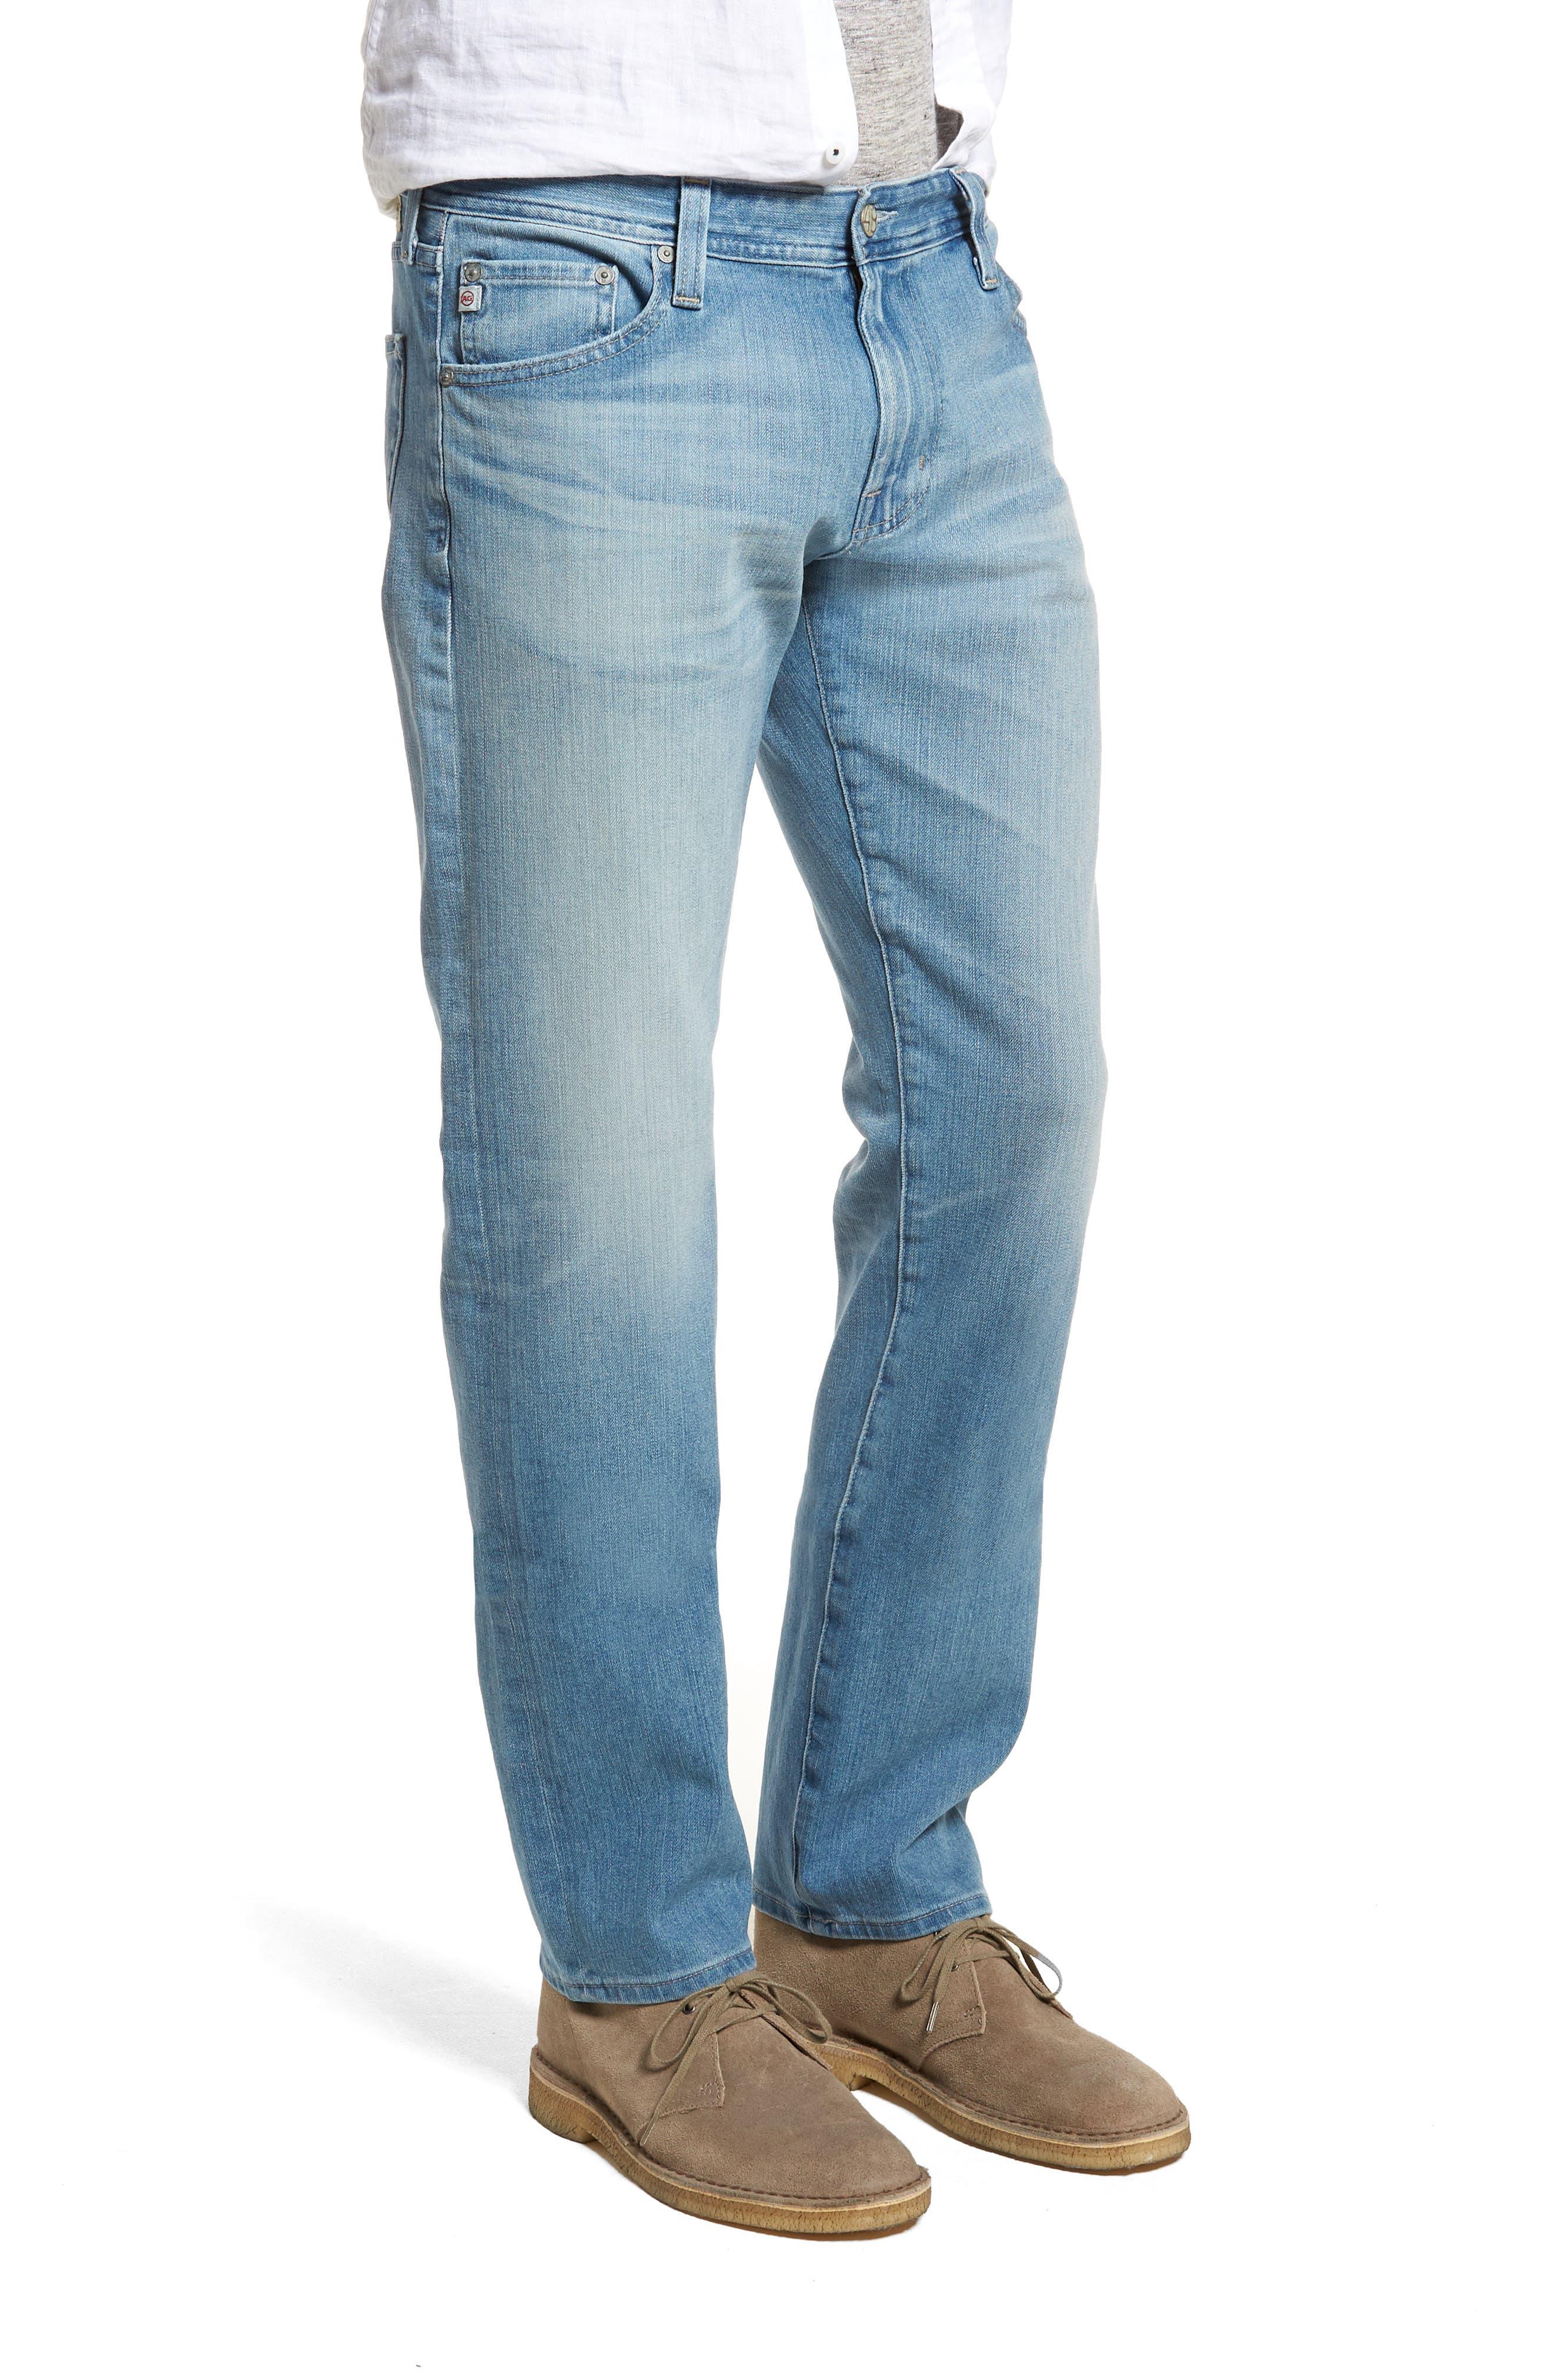 Graduate Slim Straight Leg Jeans,                             Alternate thumbnail 3, color,                             19 YEARS CHANNEL